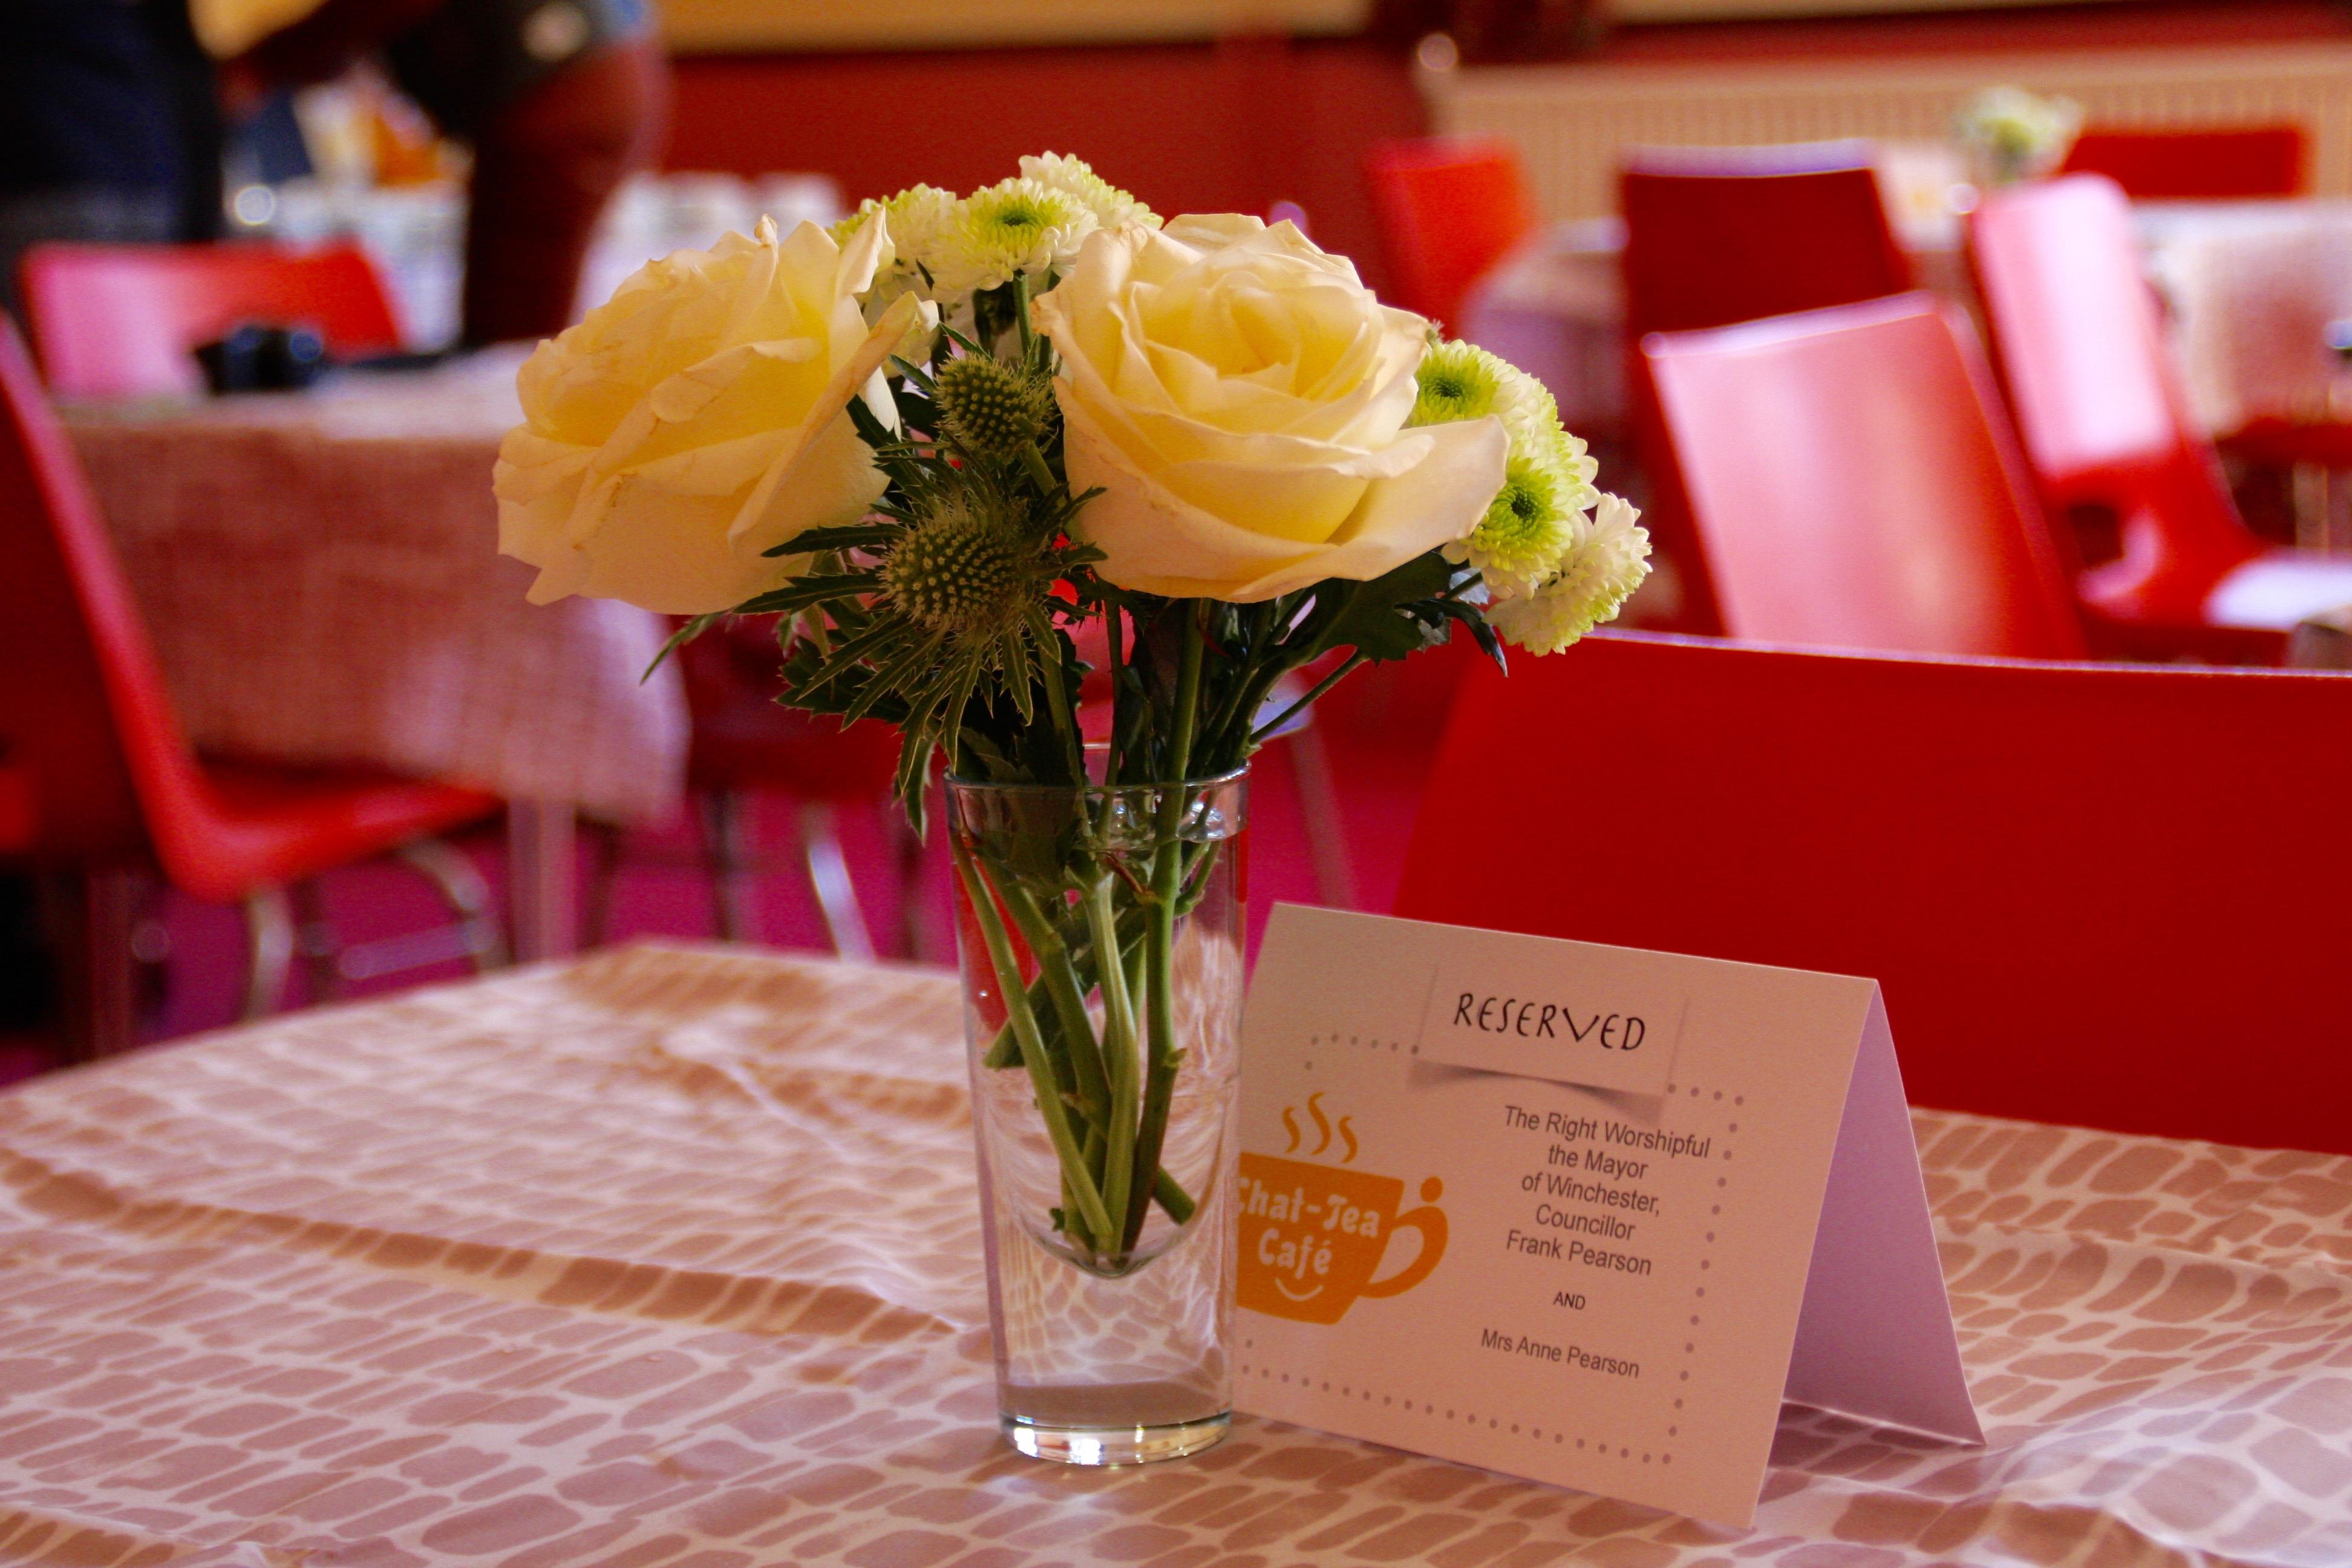 Flowers at the Chat-Tea Café